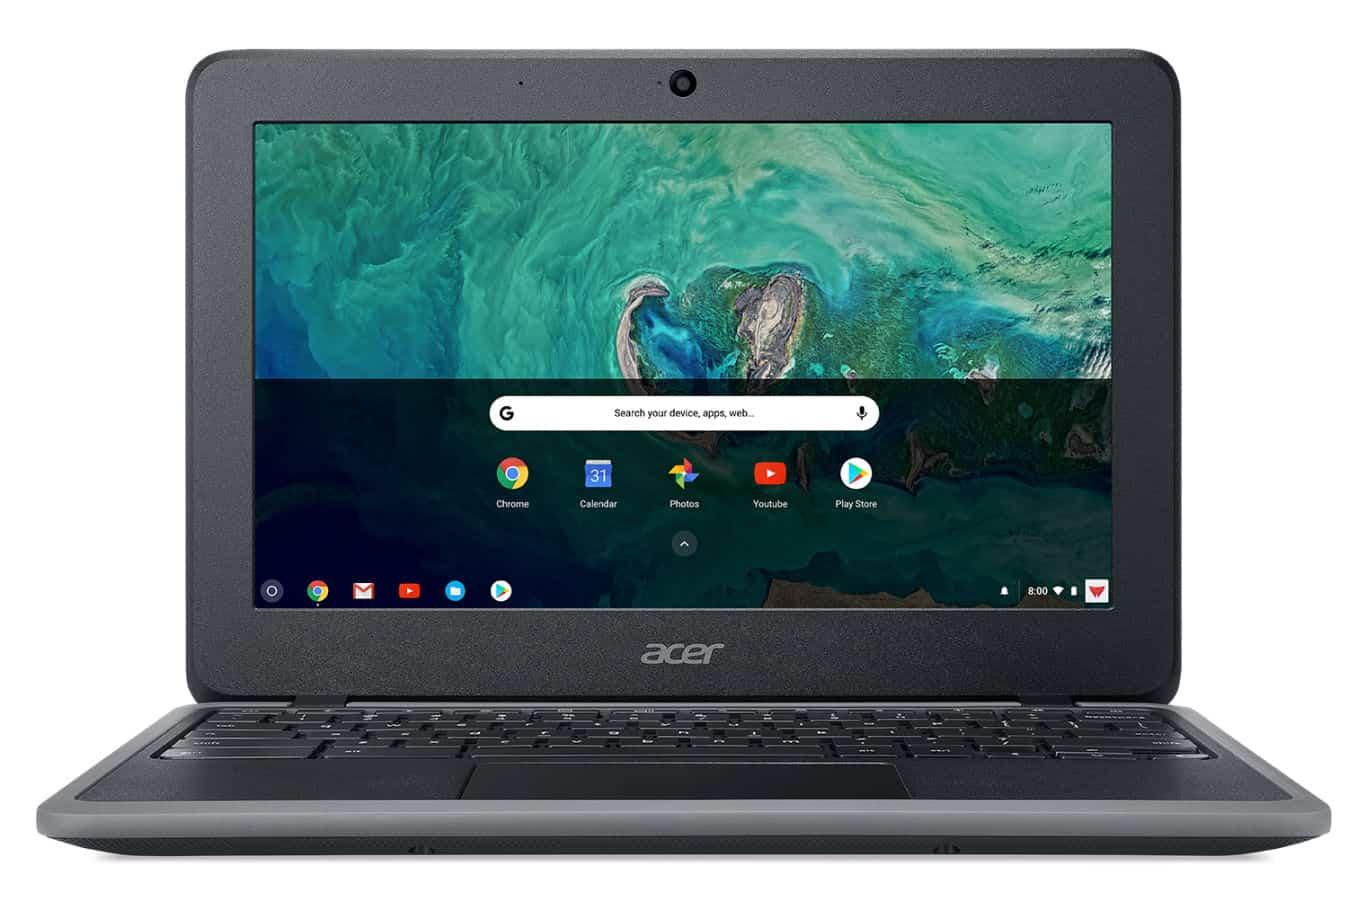 Acer Chromebook 11 C732 4